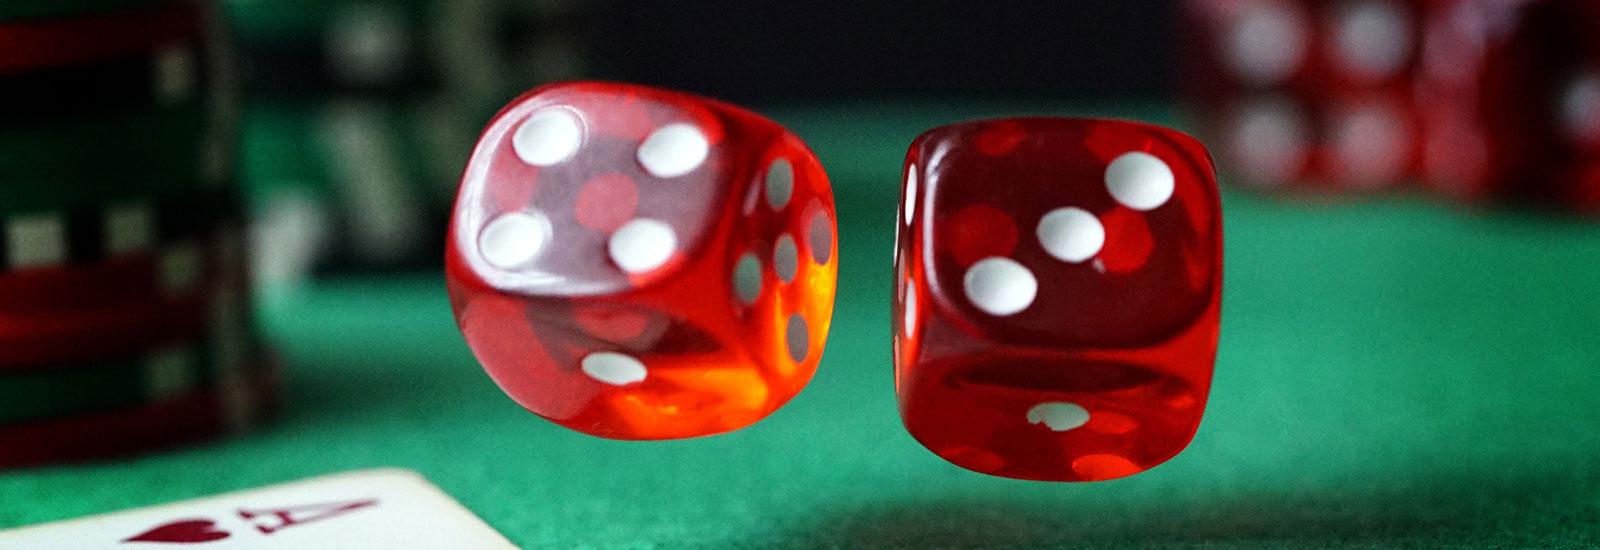 Gambling-Addiction